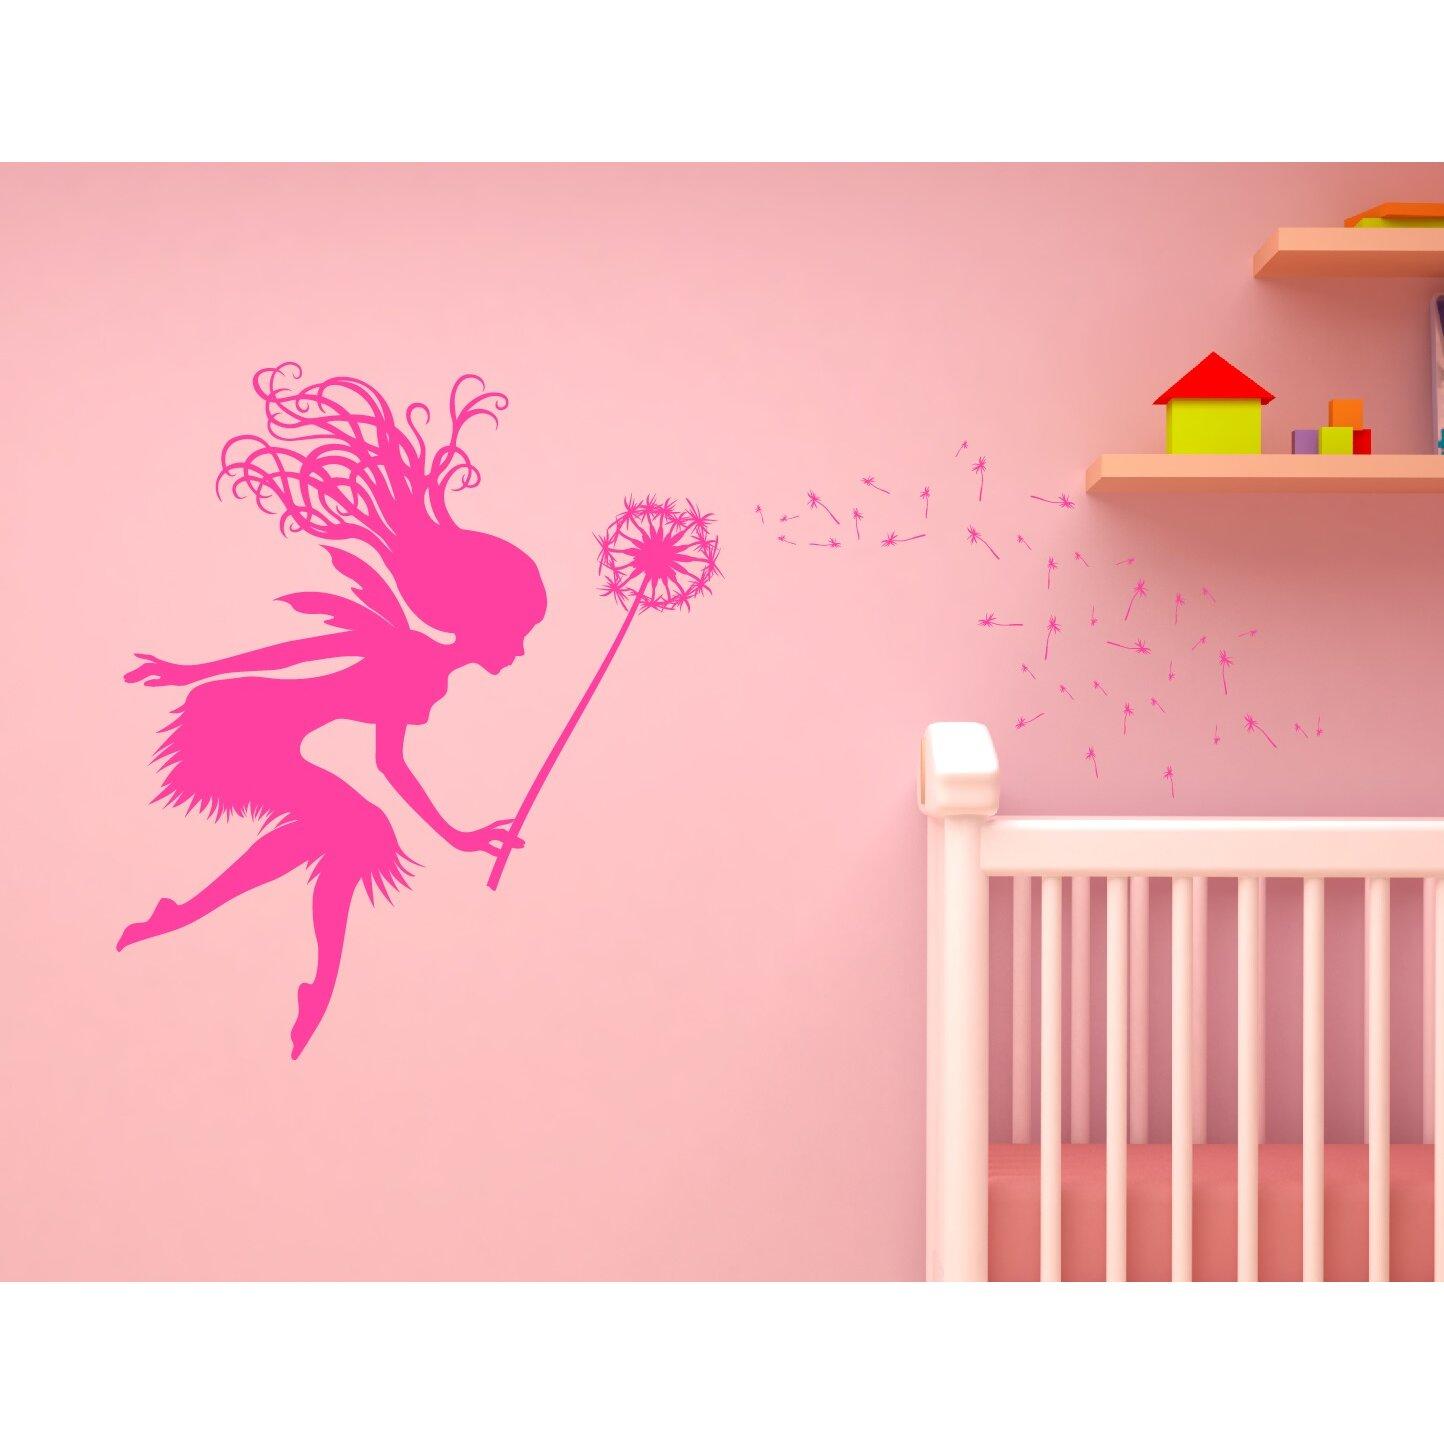 innovative stencils fairy tale dandelion wand nursery wall. Black Bedroom Furniture Sets. Home Design Ideas